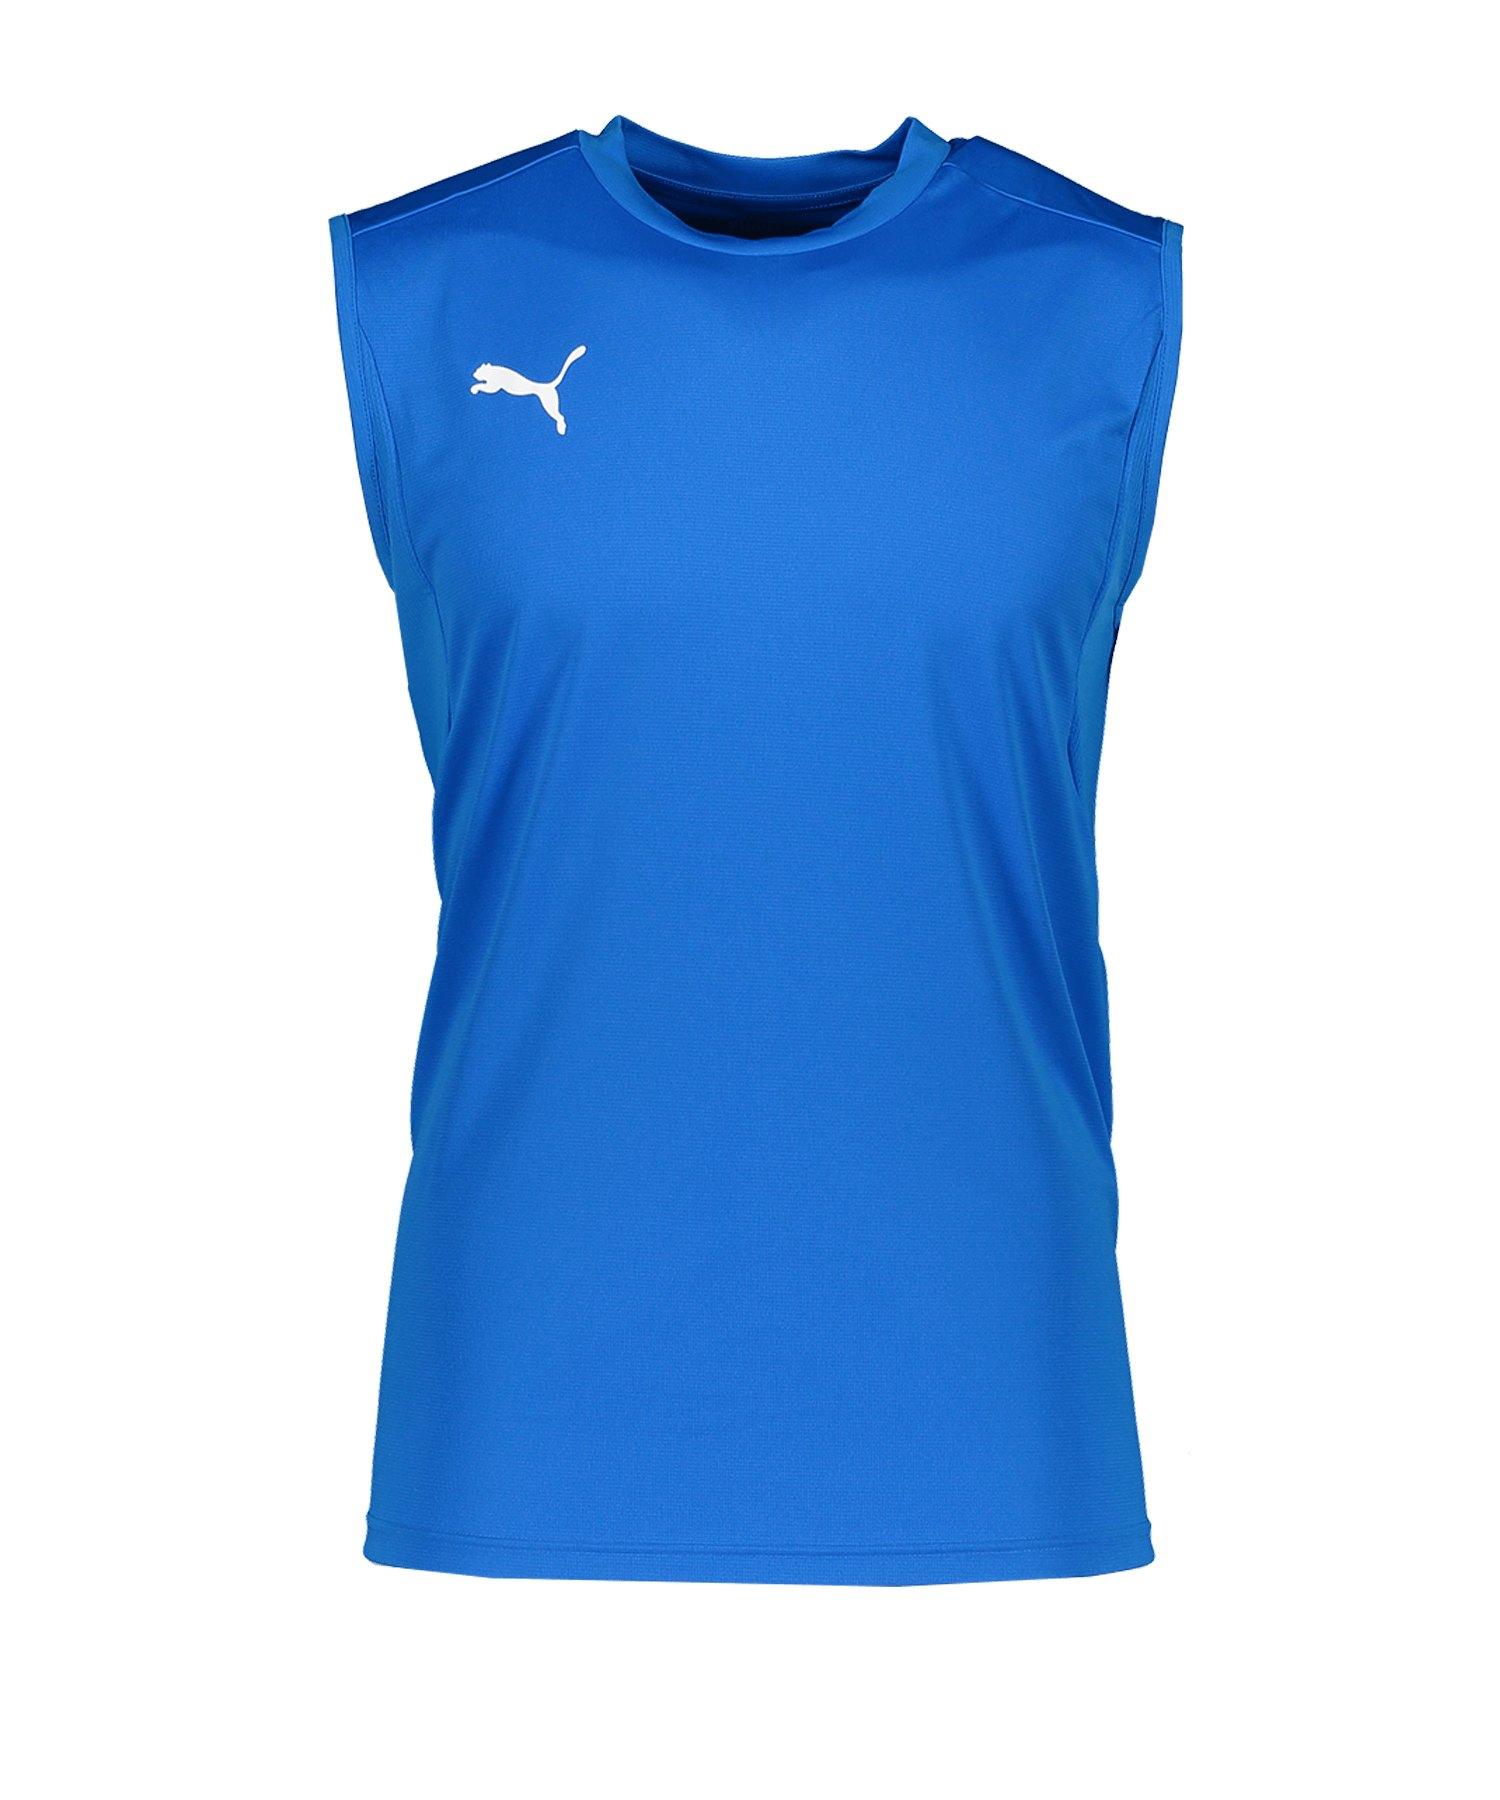 PUMA LIGA Training Jersey Sleeveless Blau F02 - blau